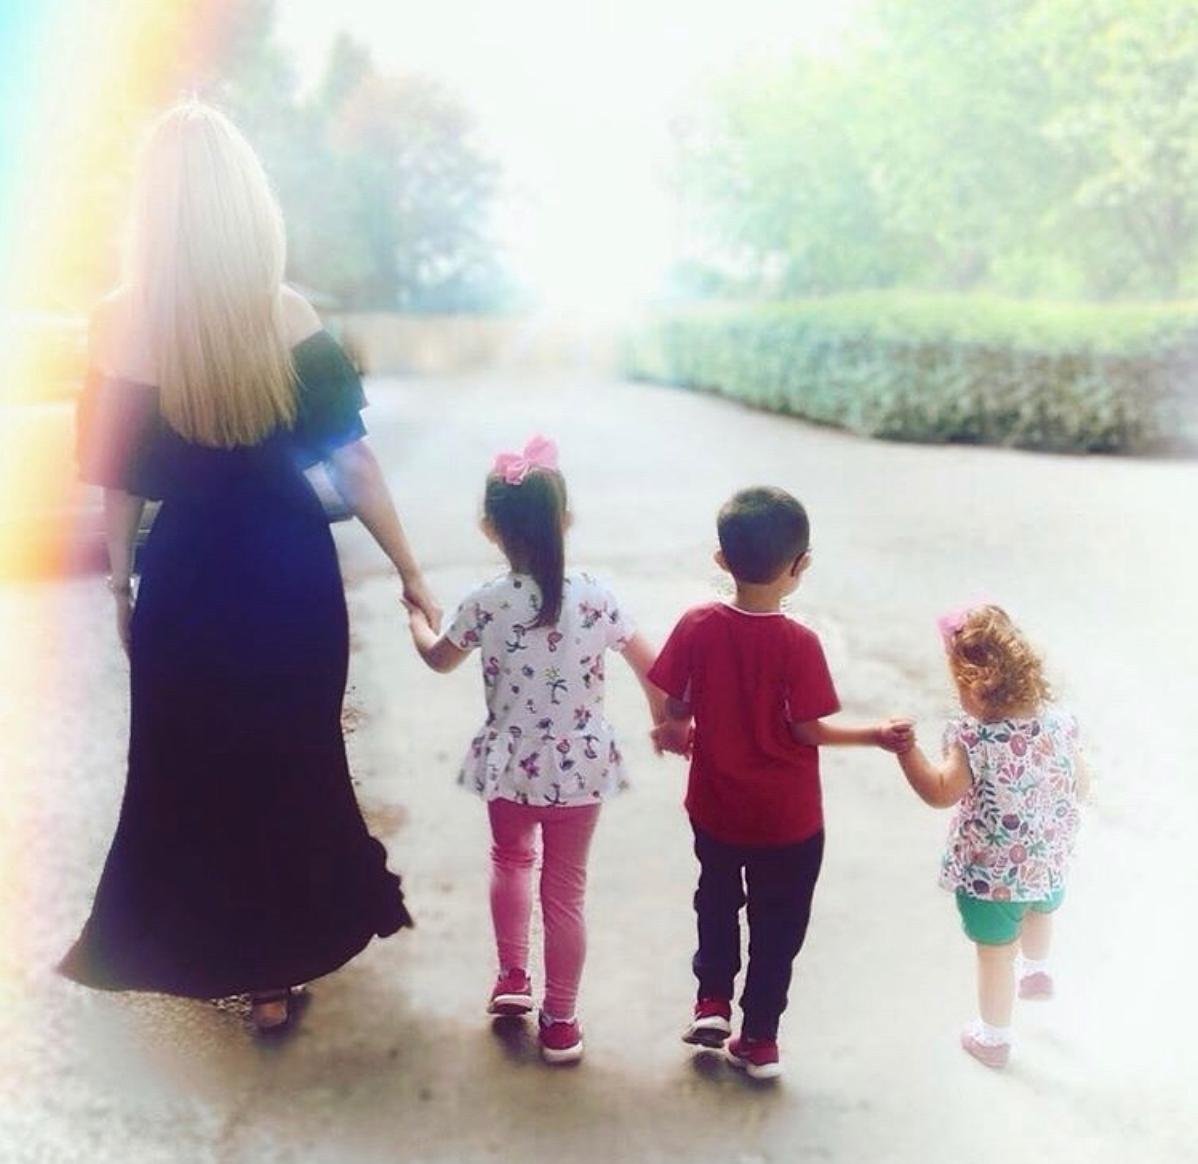 Christine McGuinness and her kids